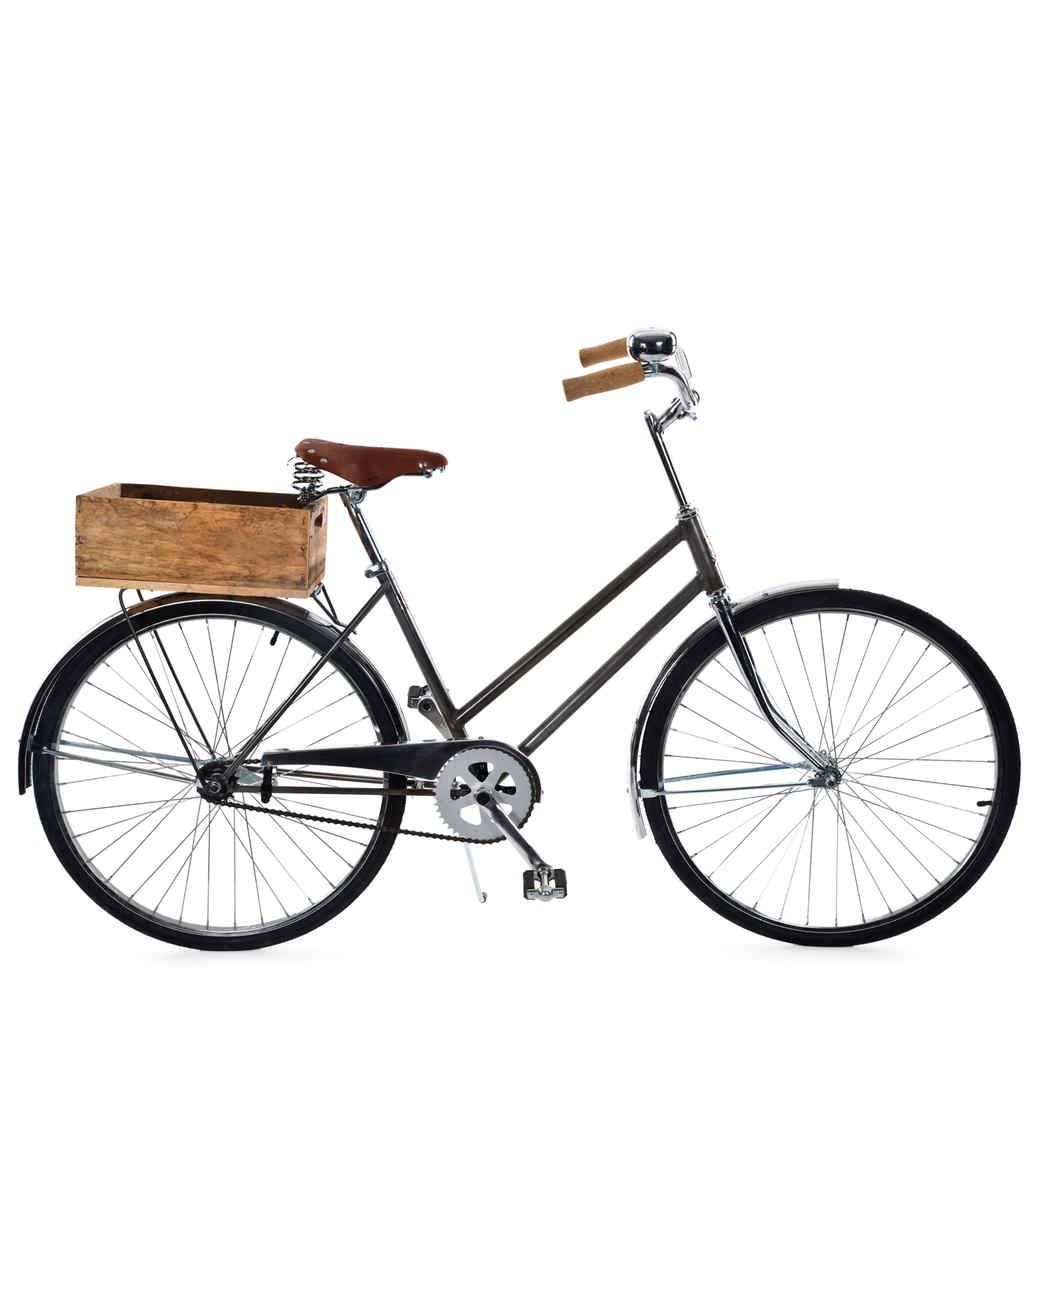 grads-bike-ms108498.jpg